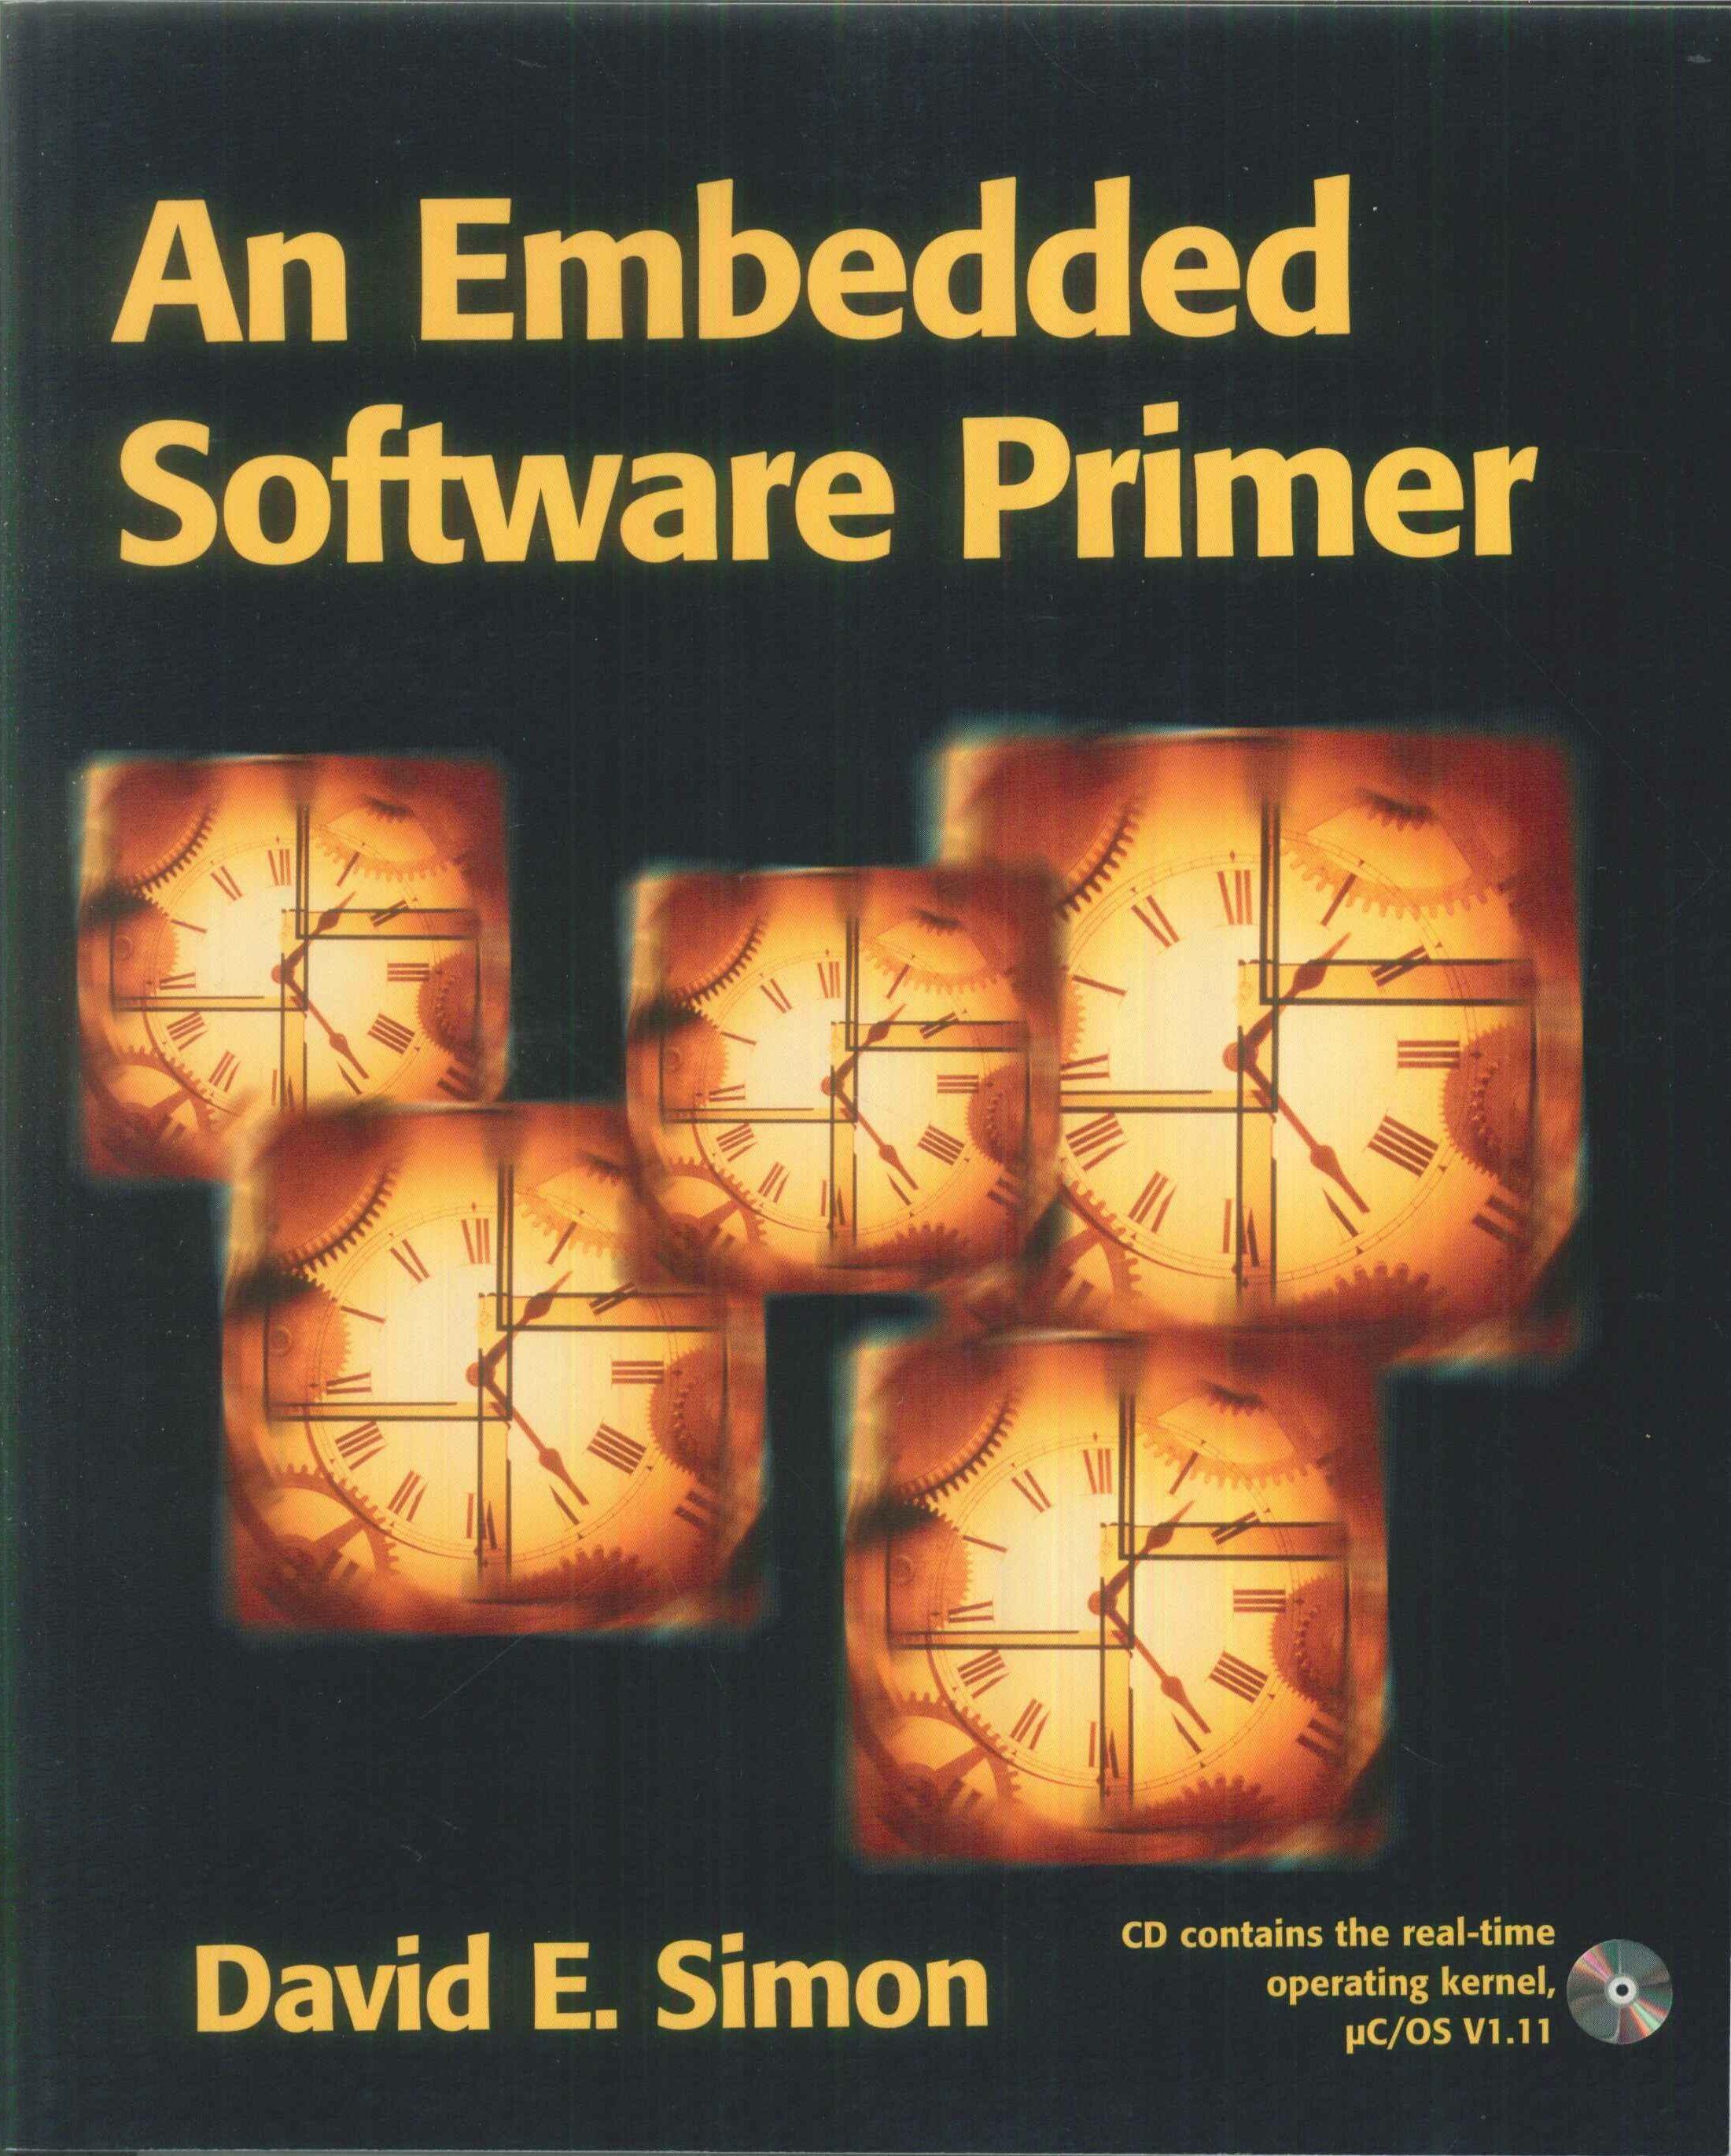 An embedded software primer / Simon, David E. / más info en: http://www.pearsoned.co.uk/bookshop/detail.asp?WT.oss=an%20embedded%20software%20primer&WT.oss_r=1&item=171026 / consulta disponibilidad en: http://biblio.uah.es/uhtbin/cgisirsi/LTr/SIRSI/0/5?searchdata1=%5EC282979